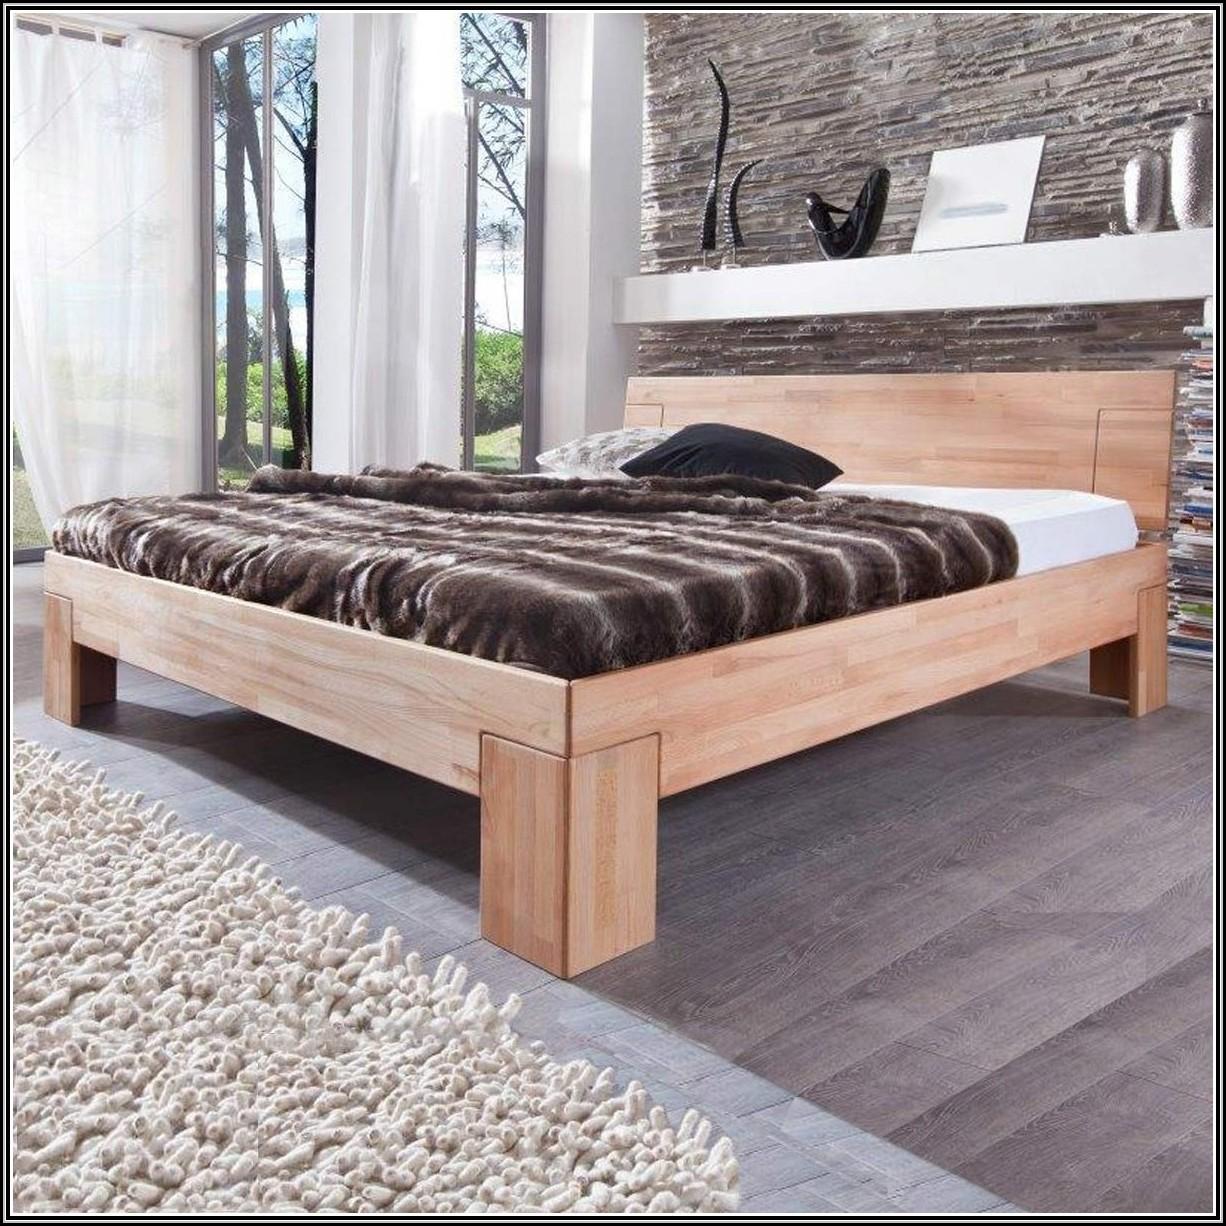 Bett 140 Cm Breit Ikea